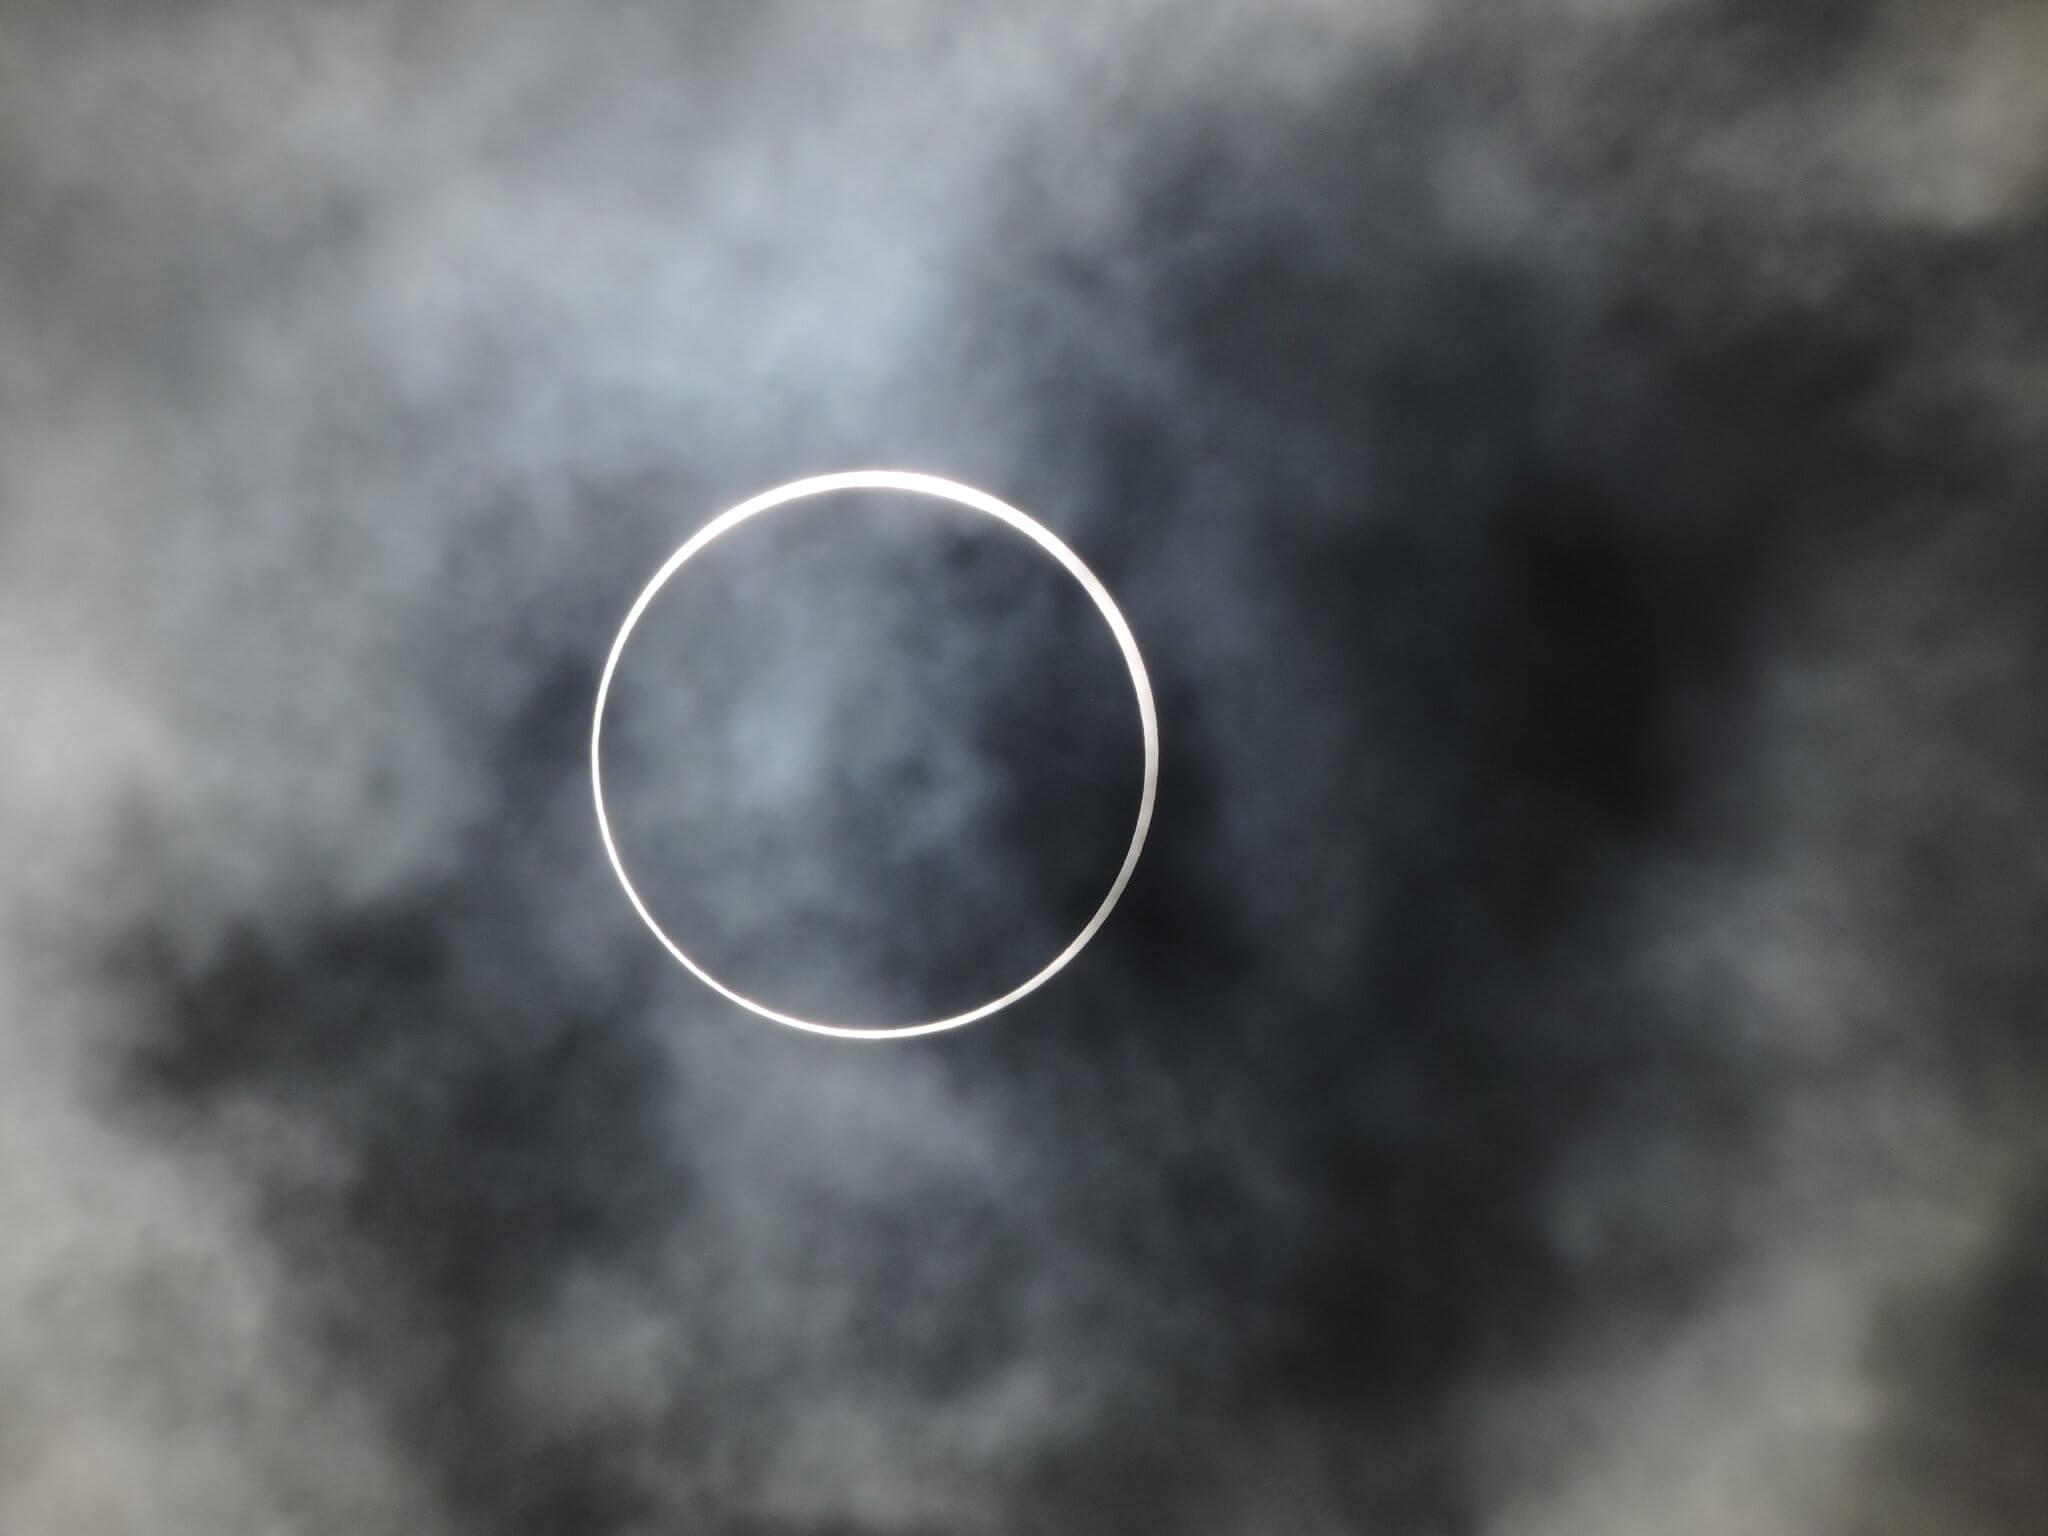 Fotos: Ringförmige Sonnenfinsternis